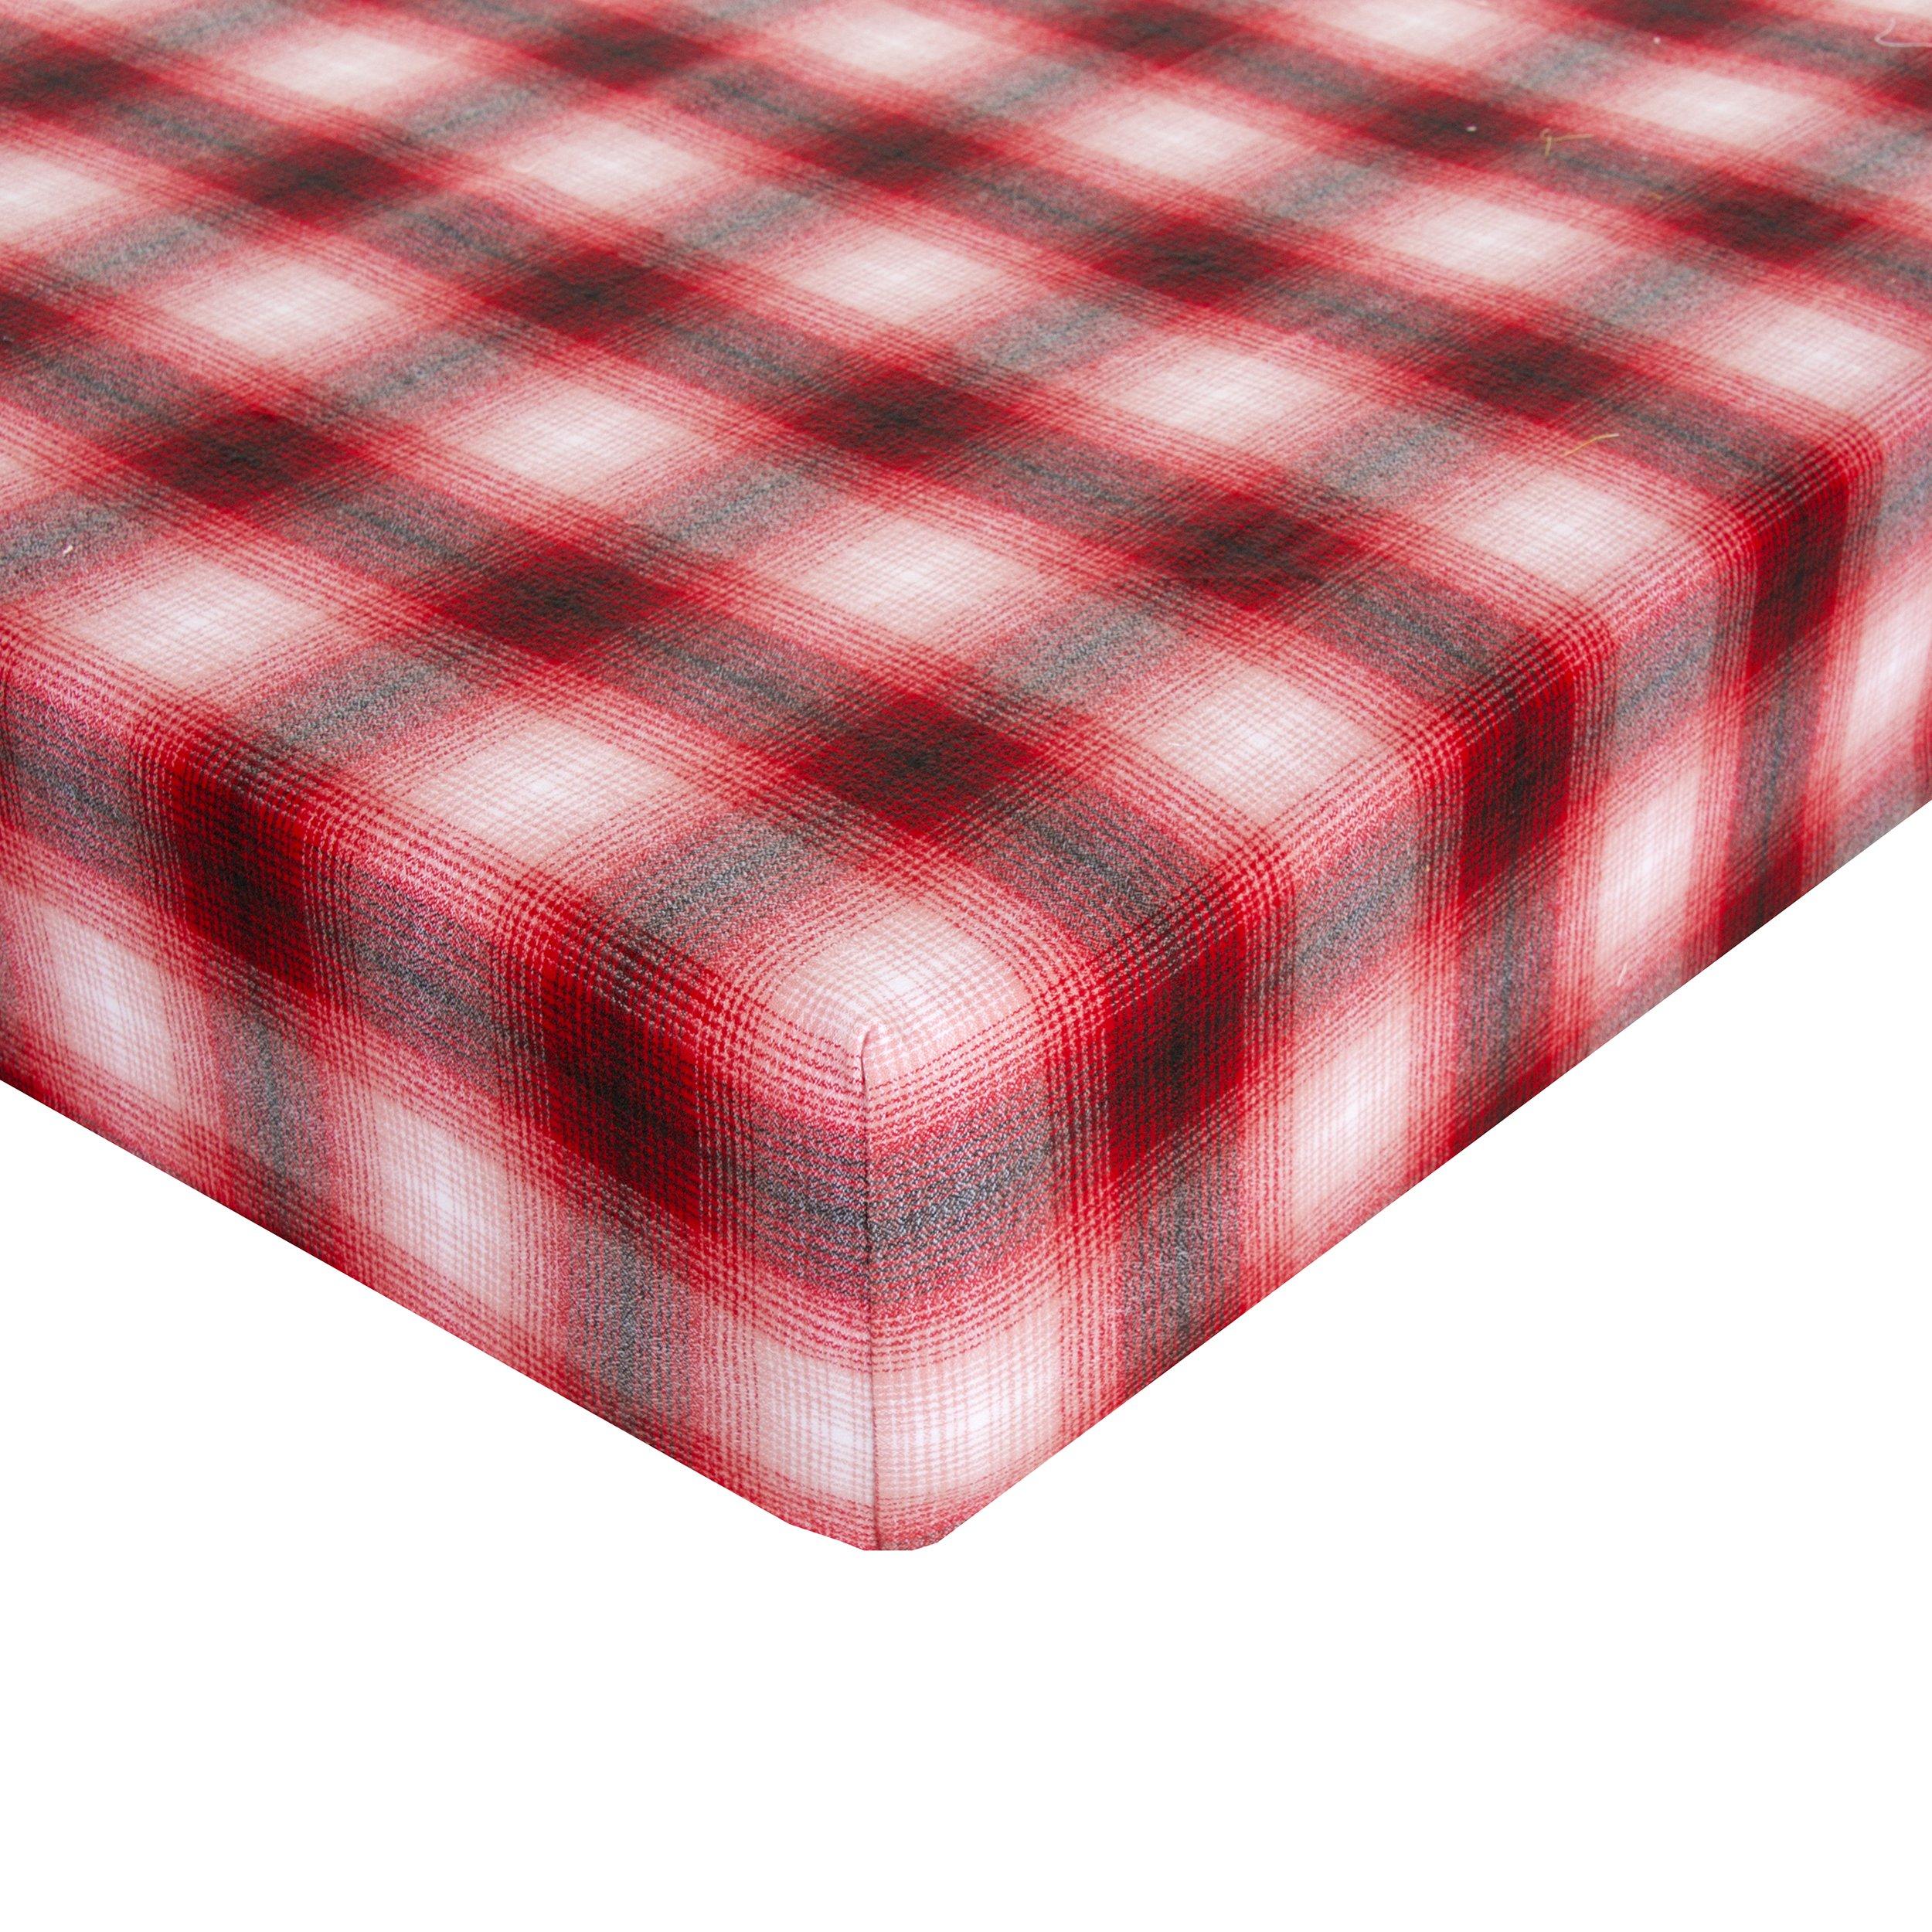 Glenna Jean Lumberjack Flannel Crib Sheet Fitted 28''x52''x8'' Nursery Standard